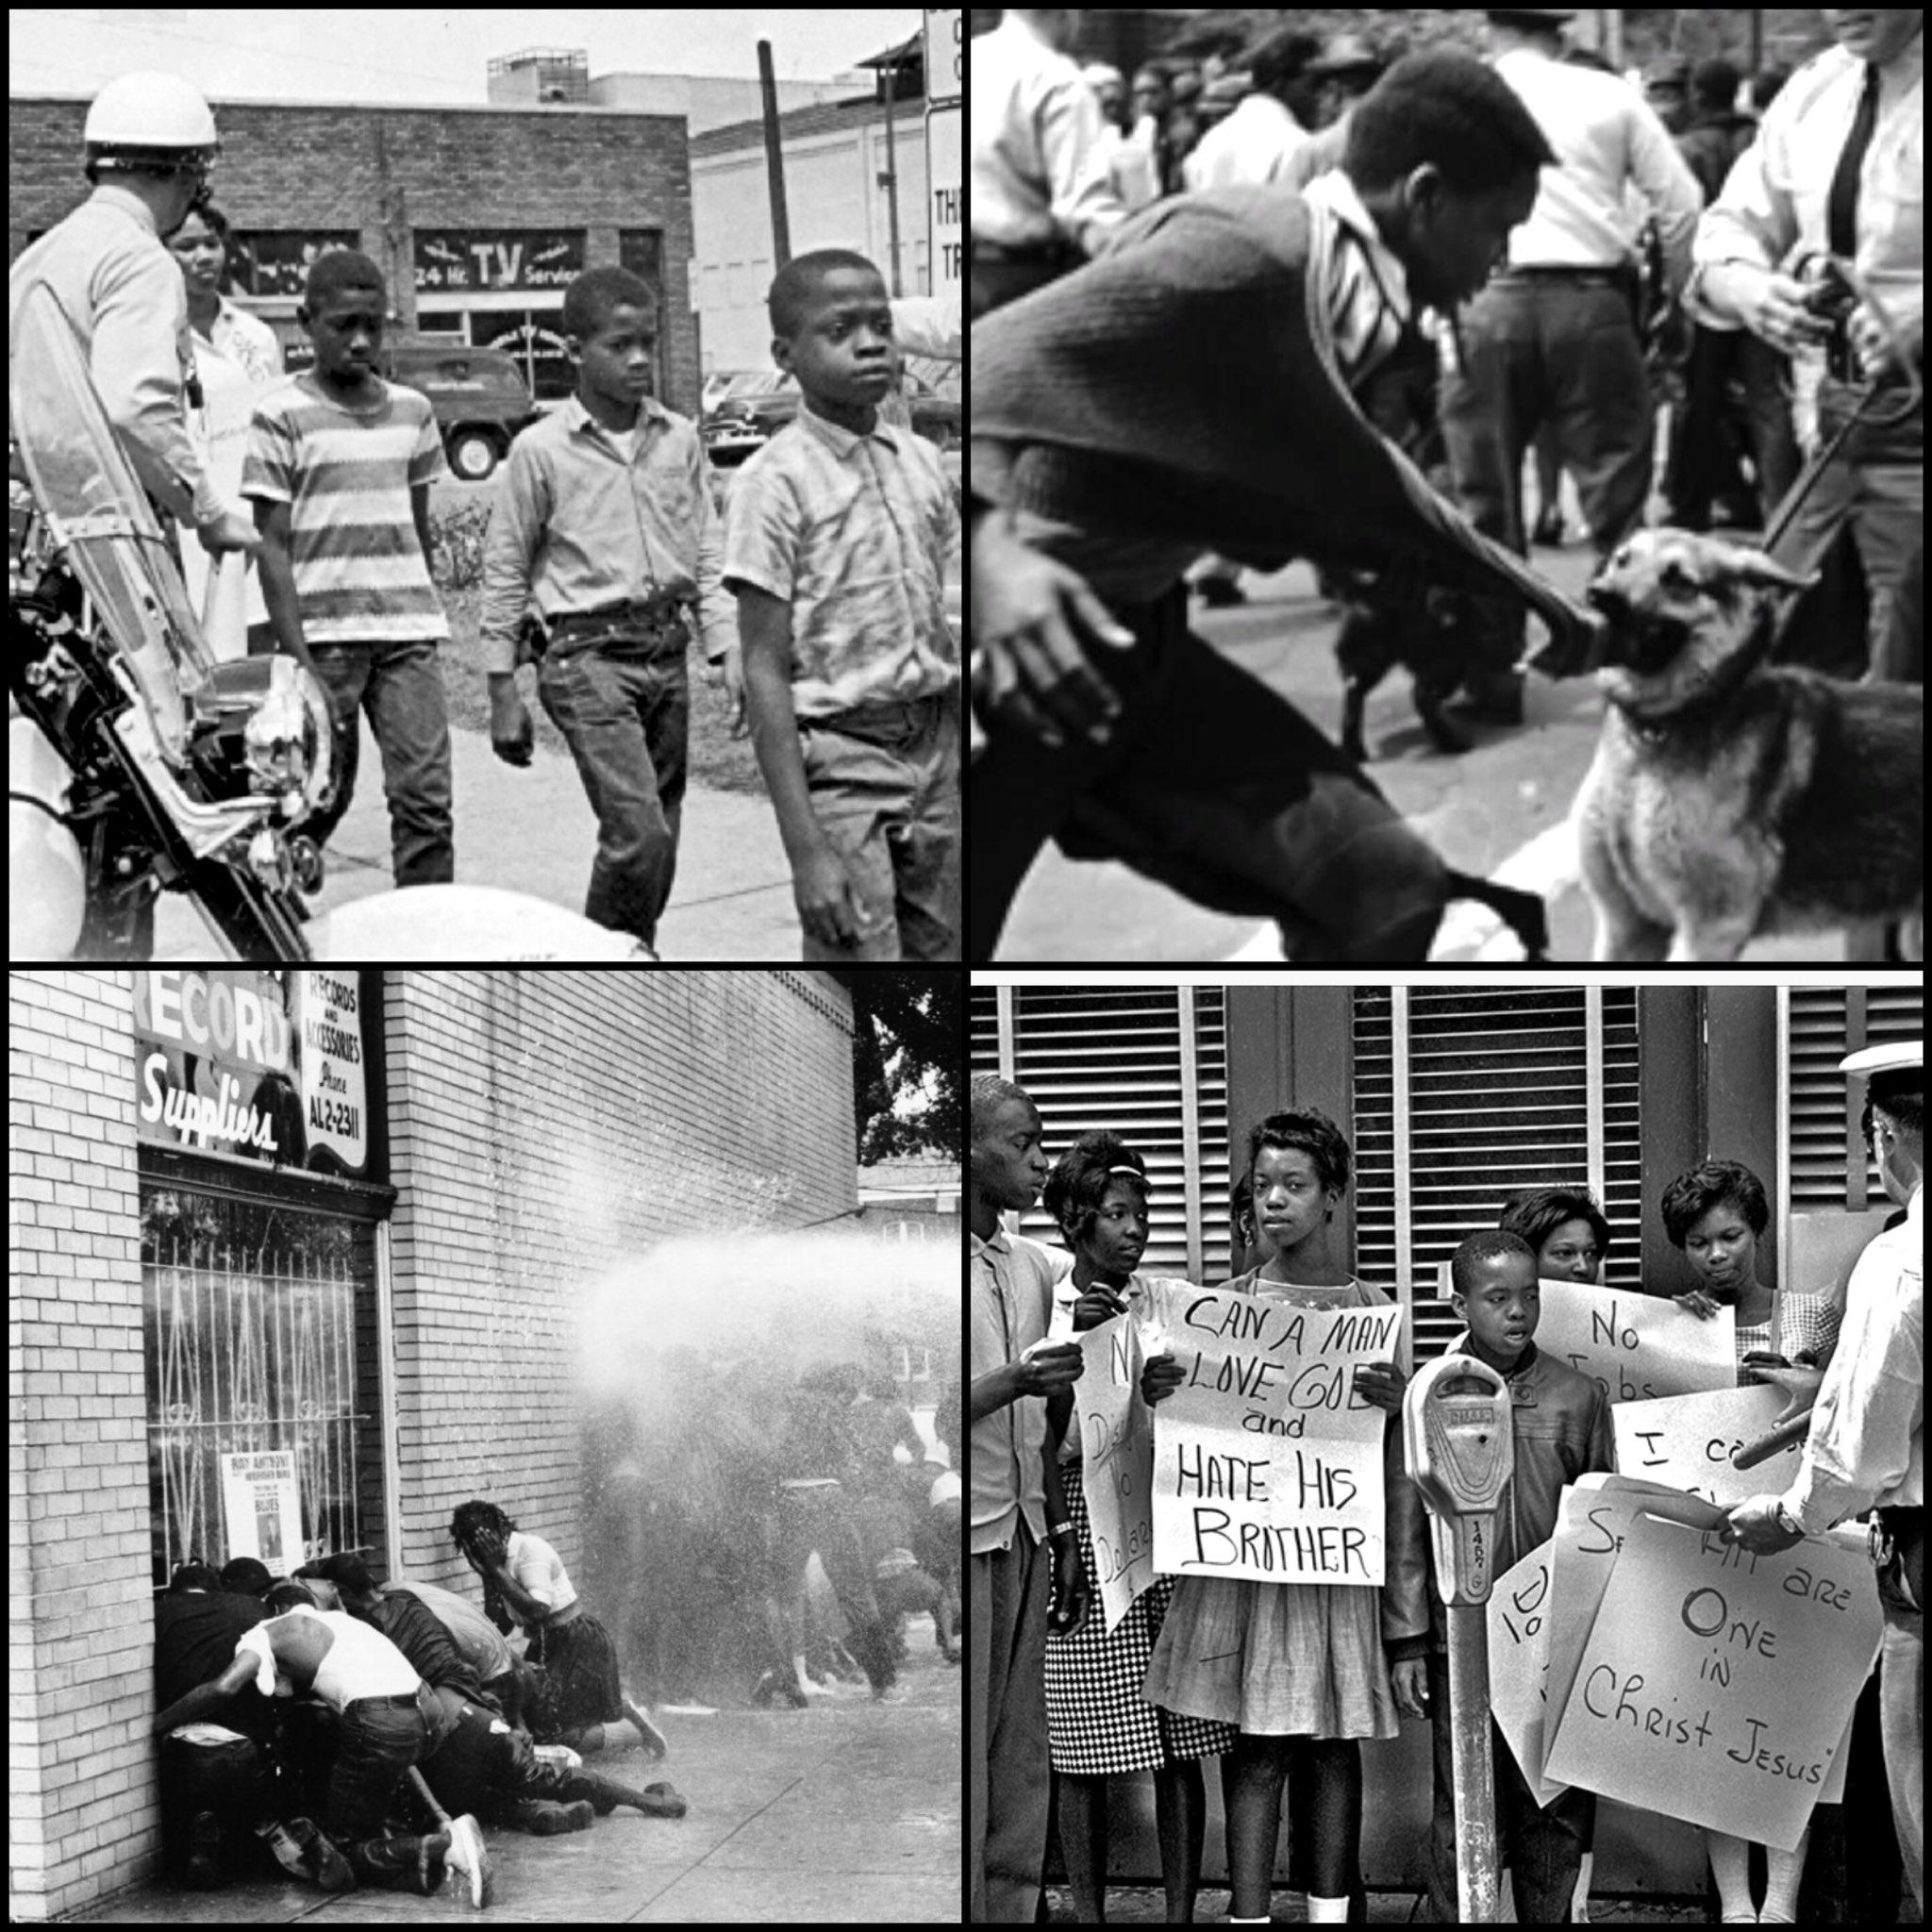 Birmingham | Children's Crusade | 1963 https://t.co/hNQyBX6EZx